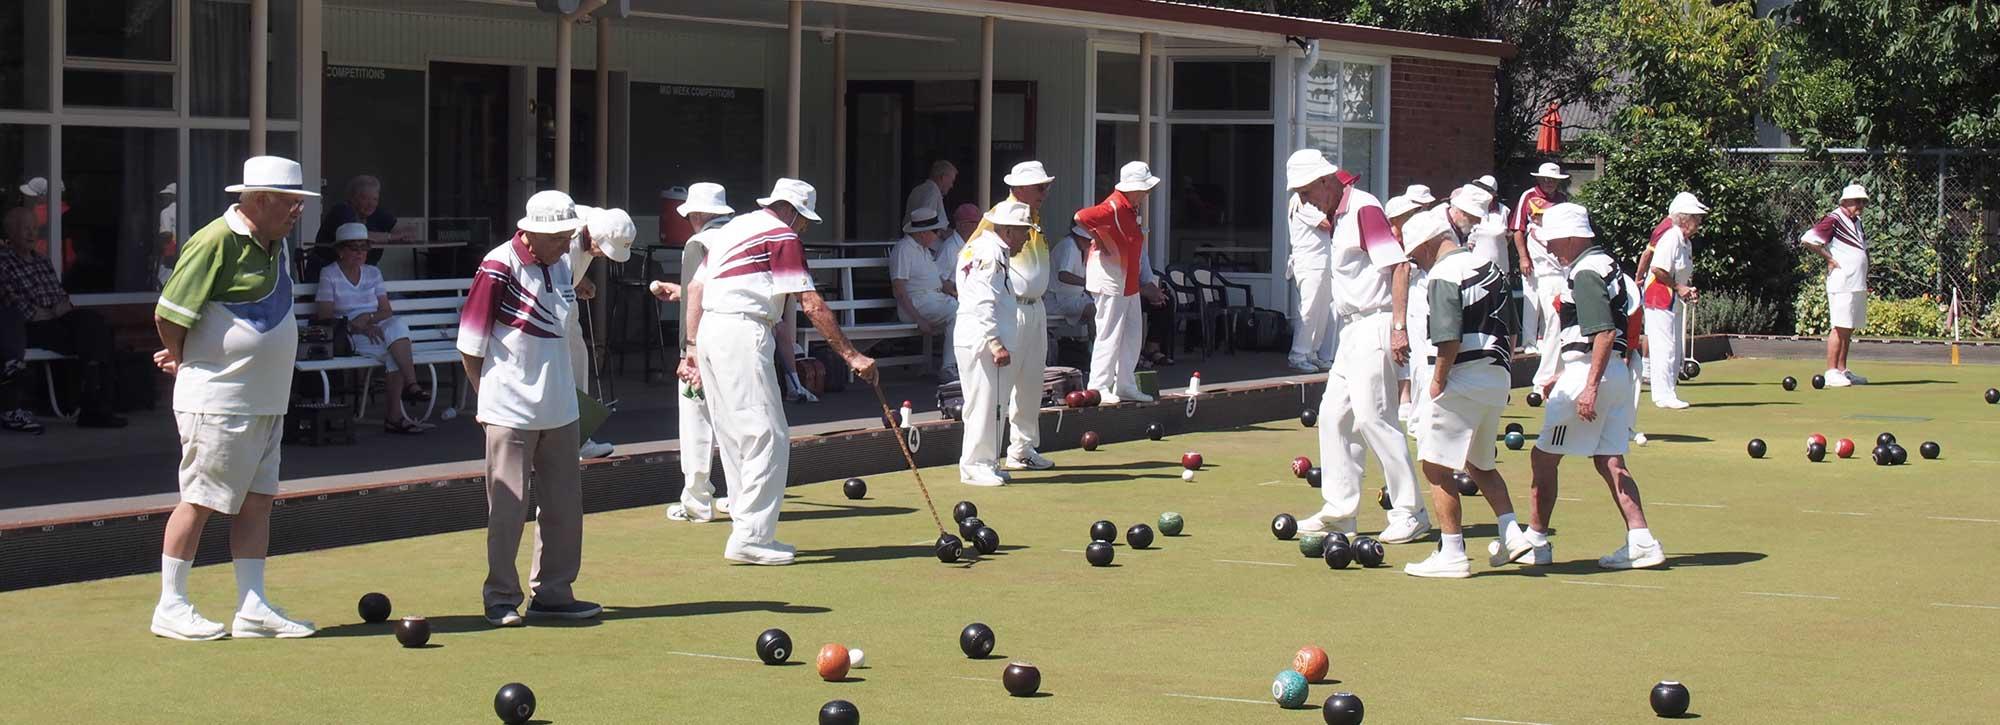 Interclub bowls competition